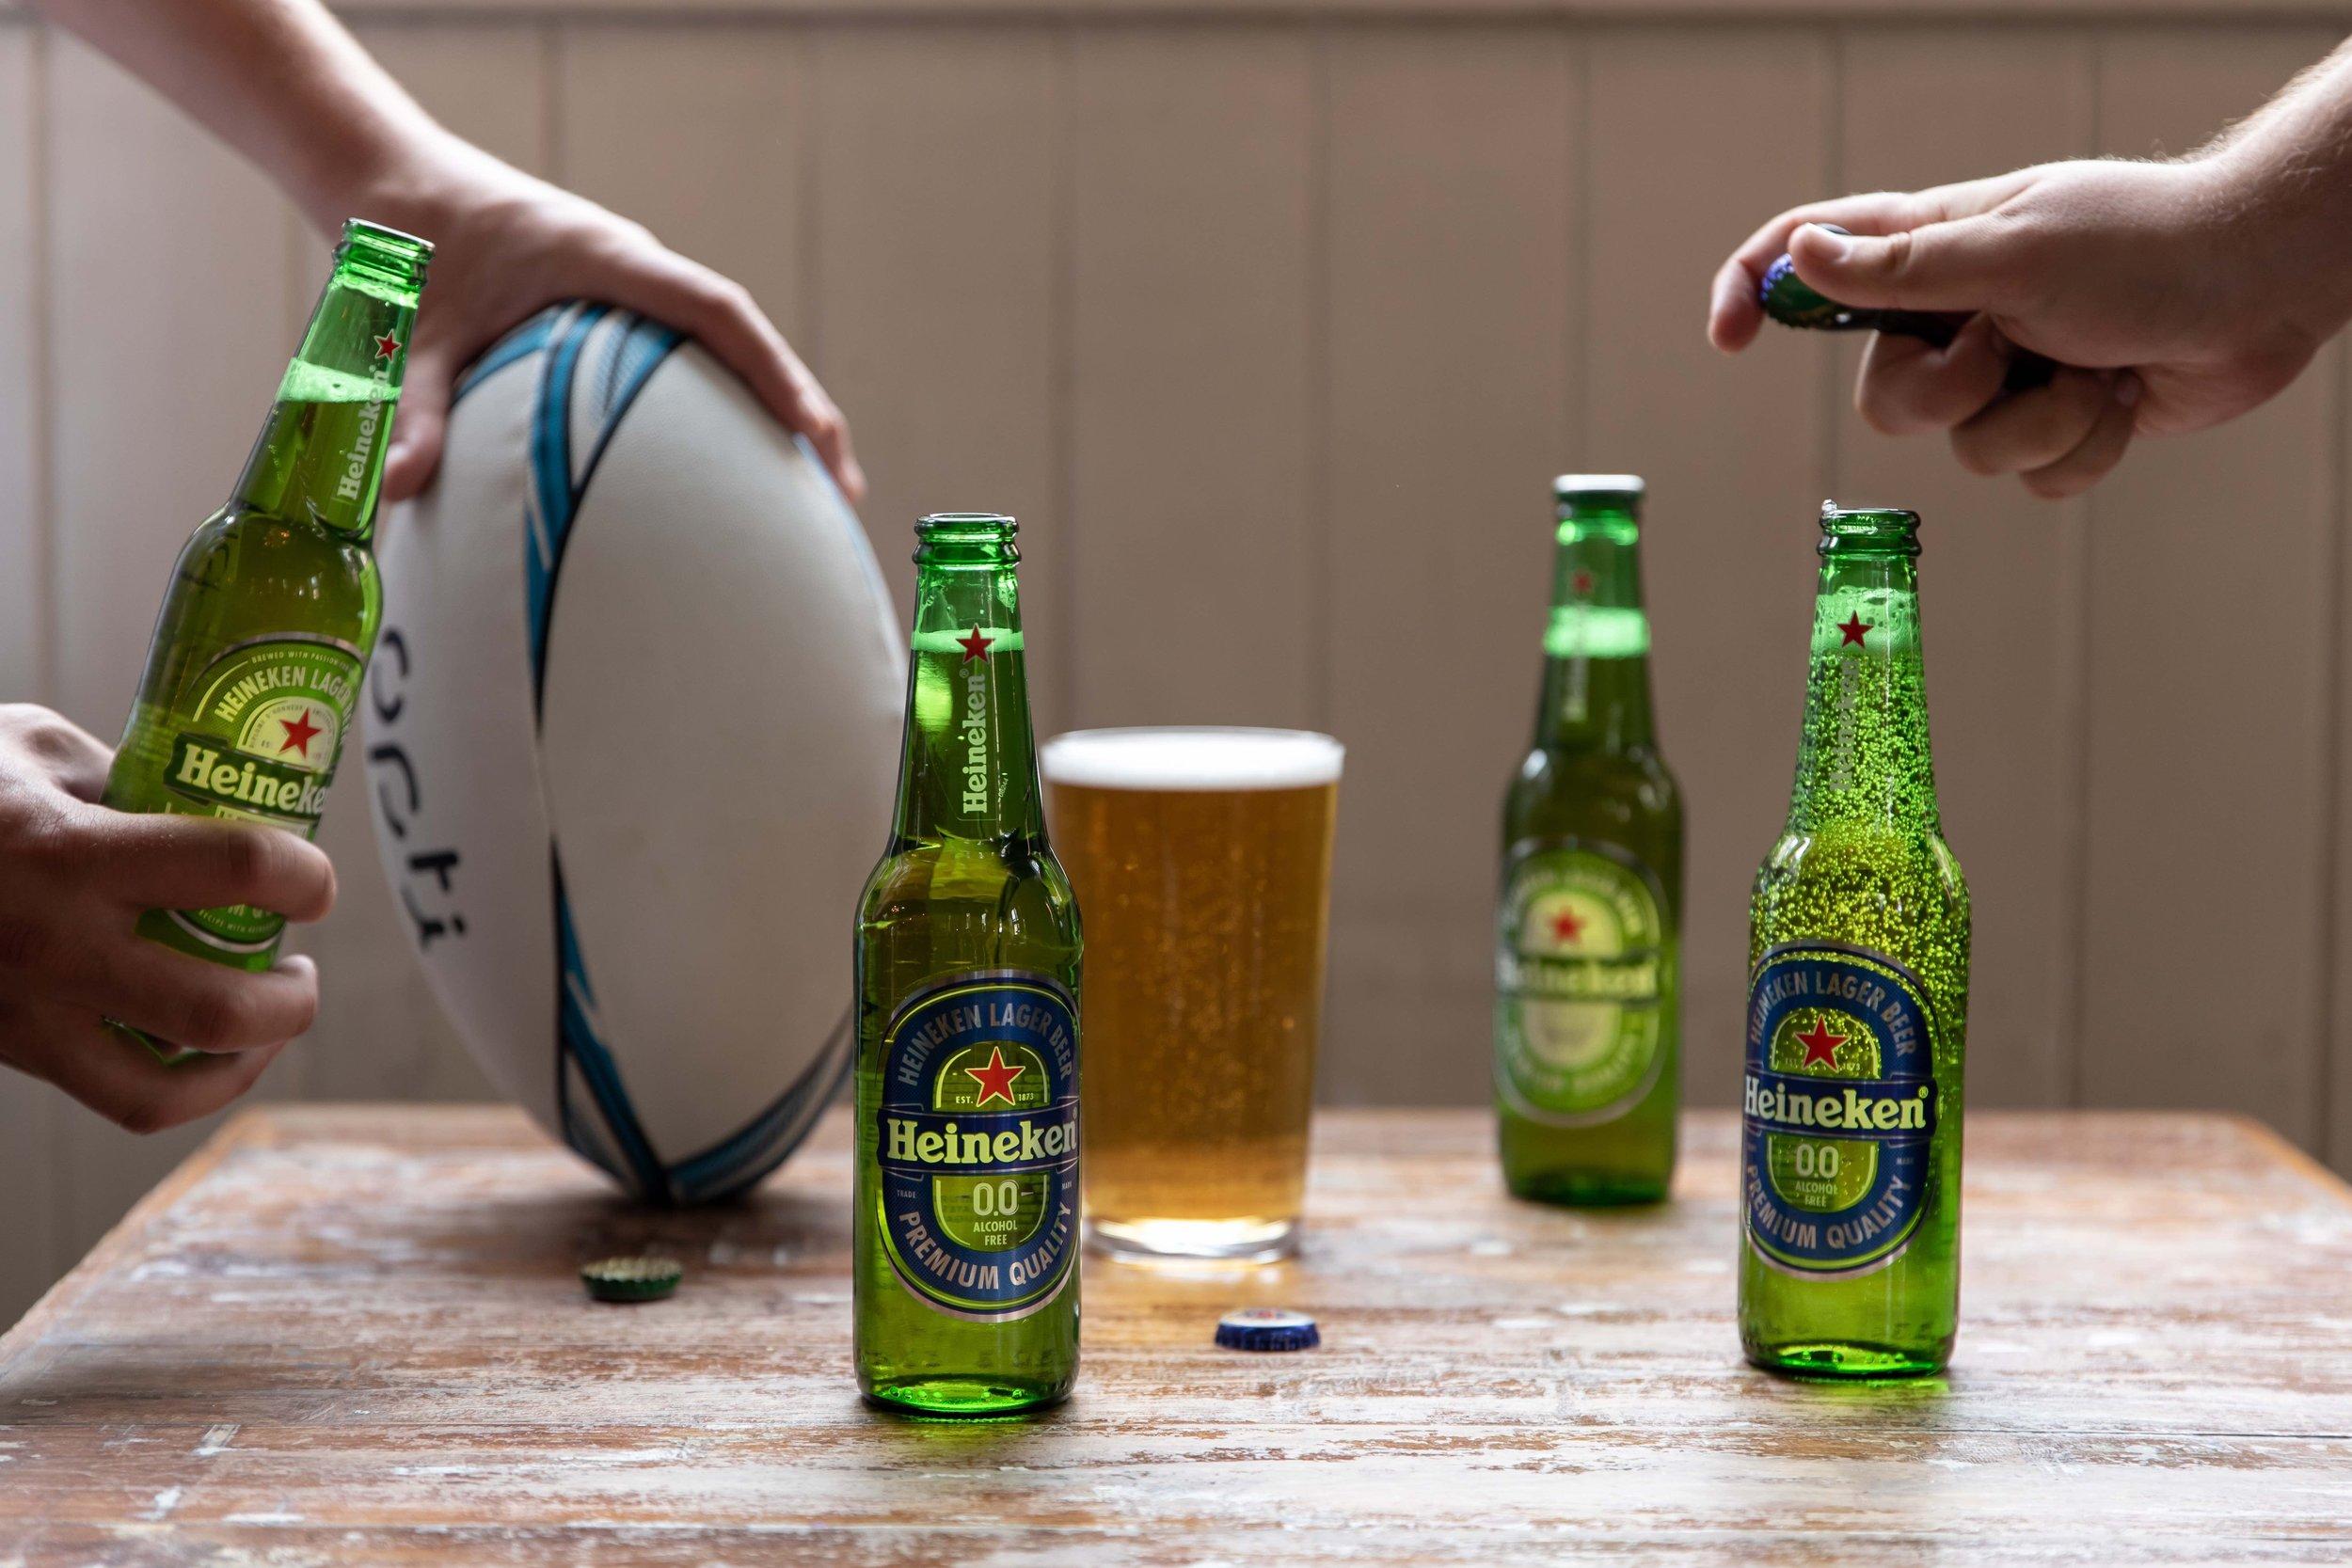 rugby urban pubs and bar_1.jpg